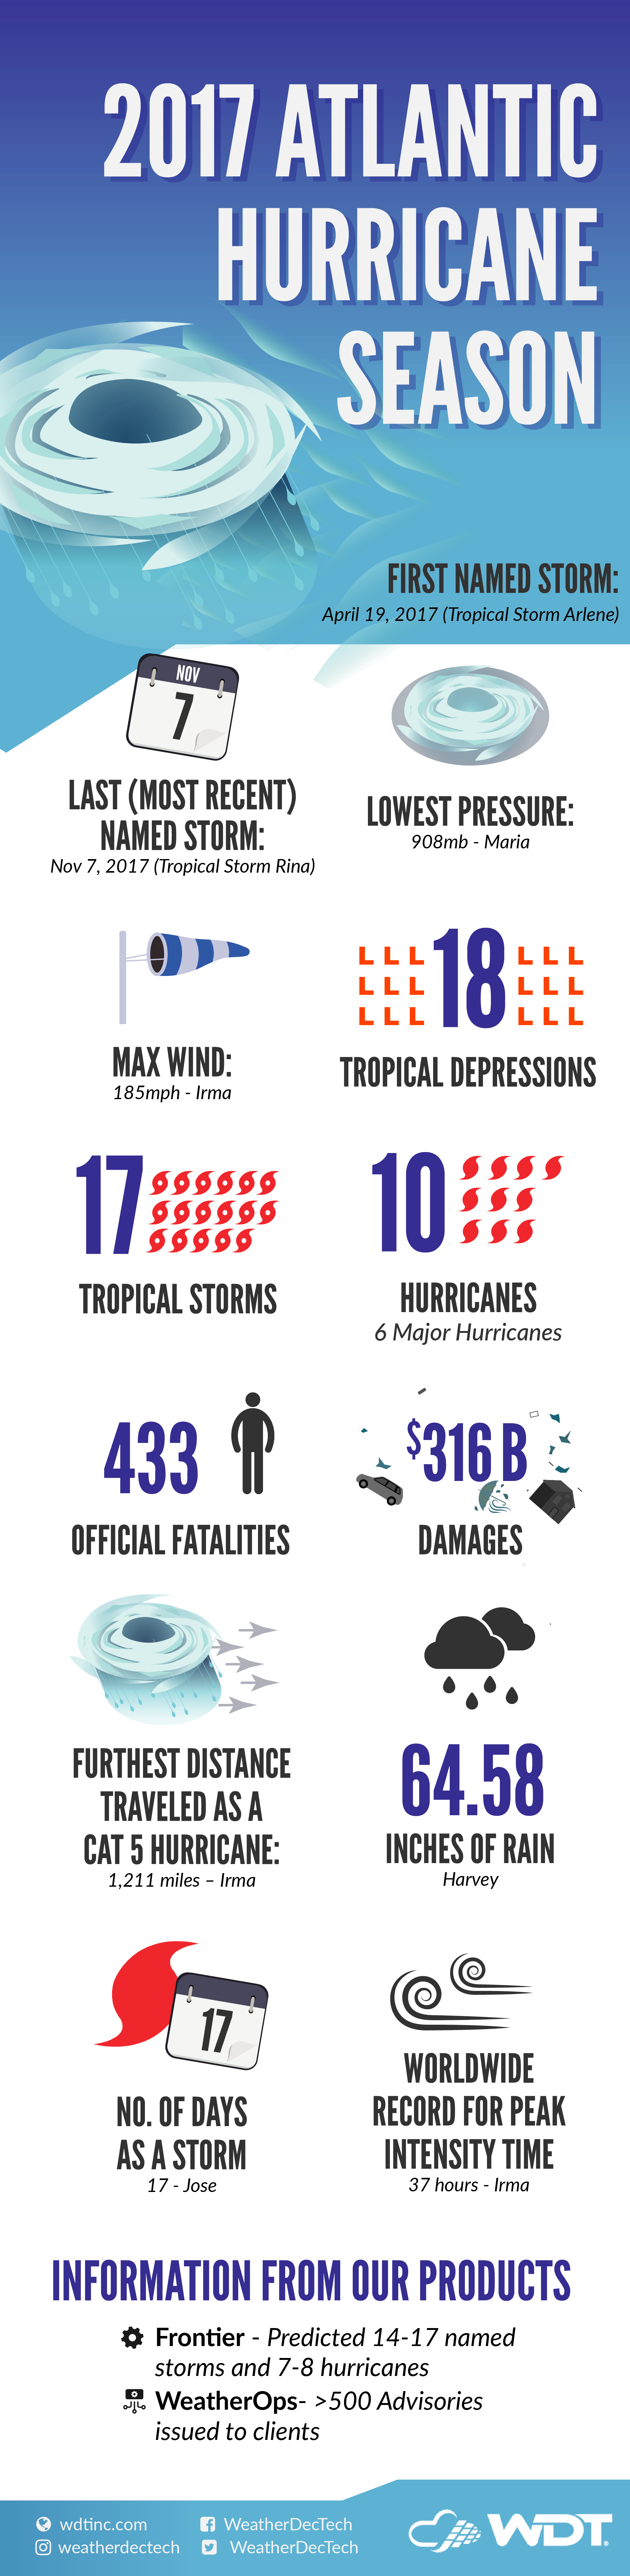 2017-hurricane-season_infographic.png